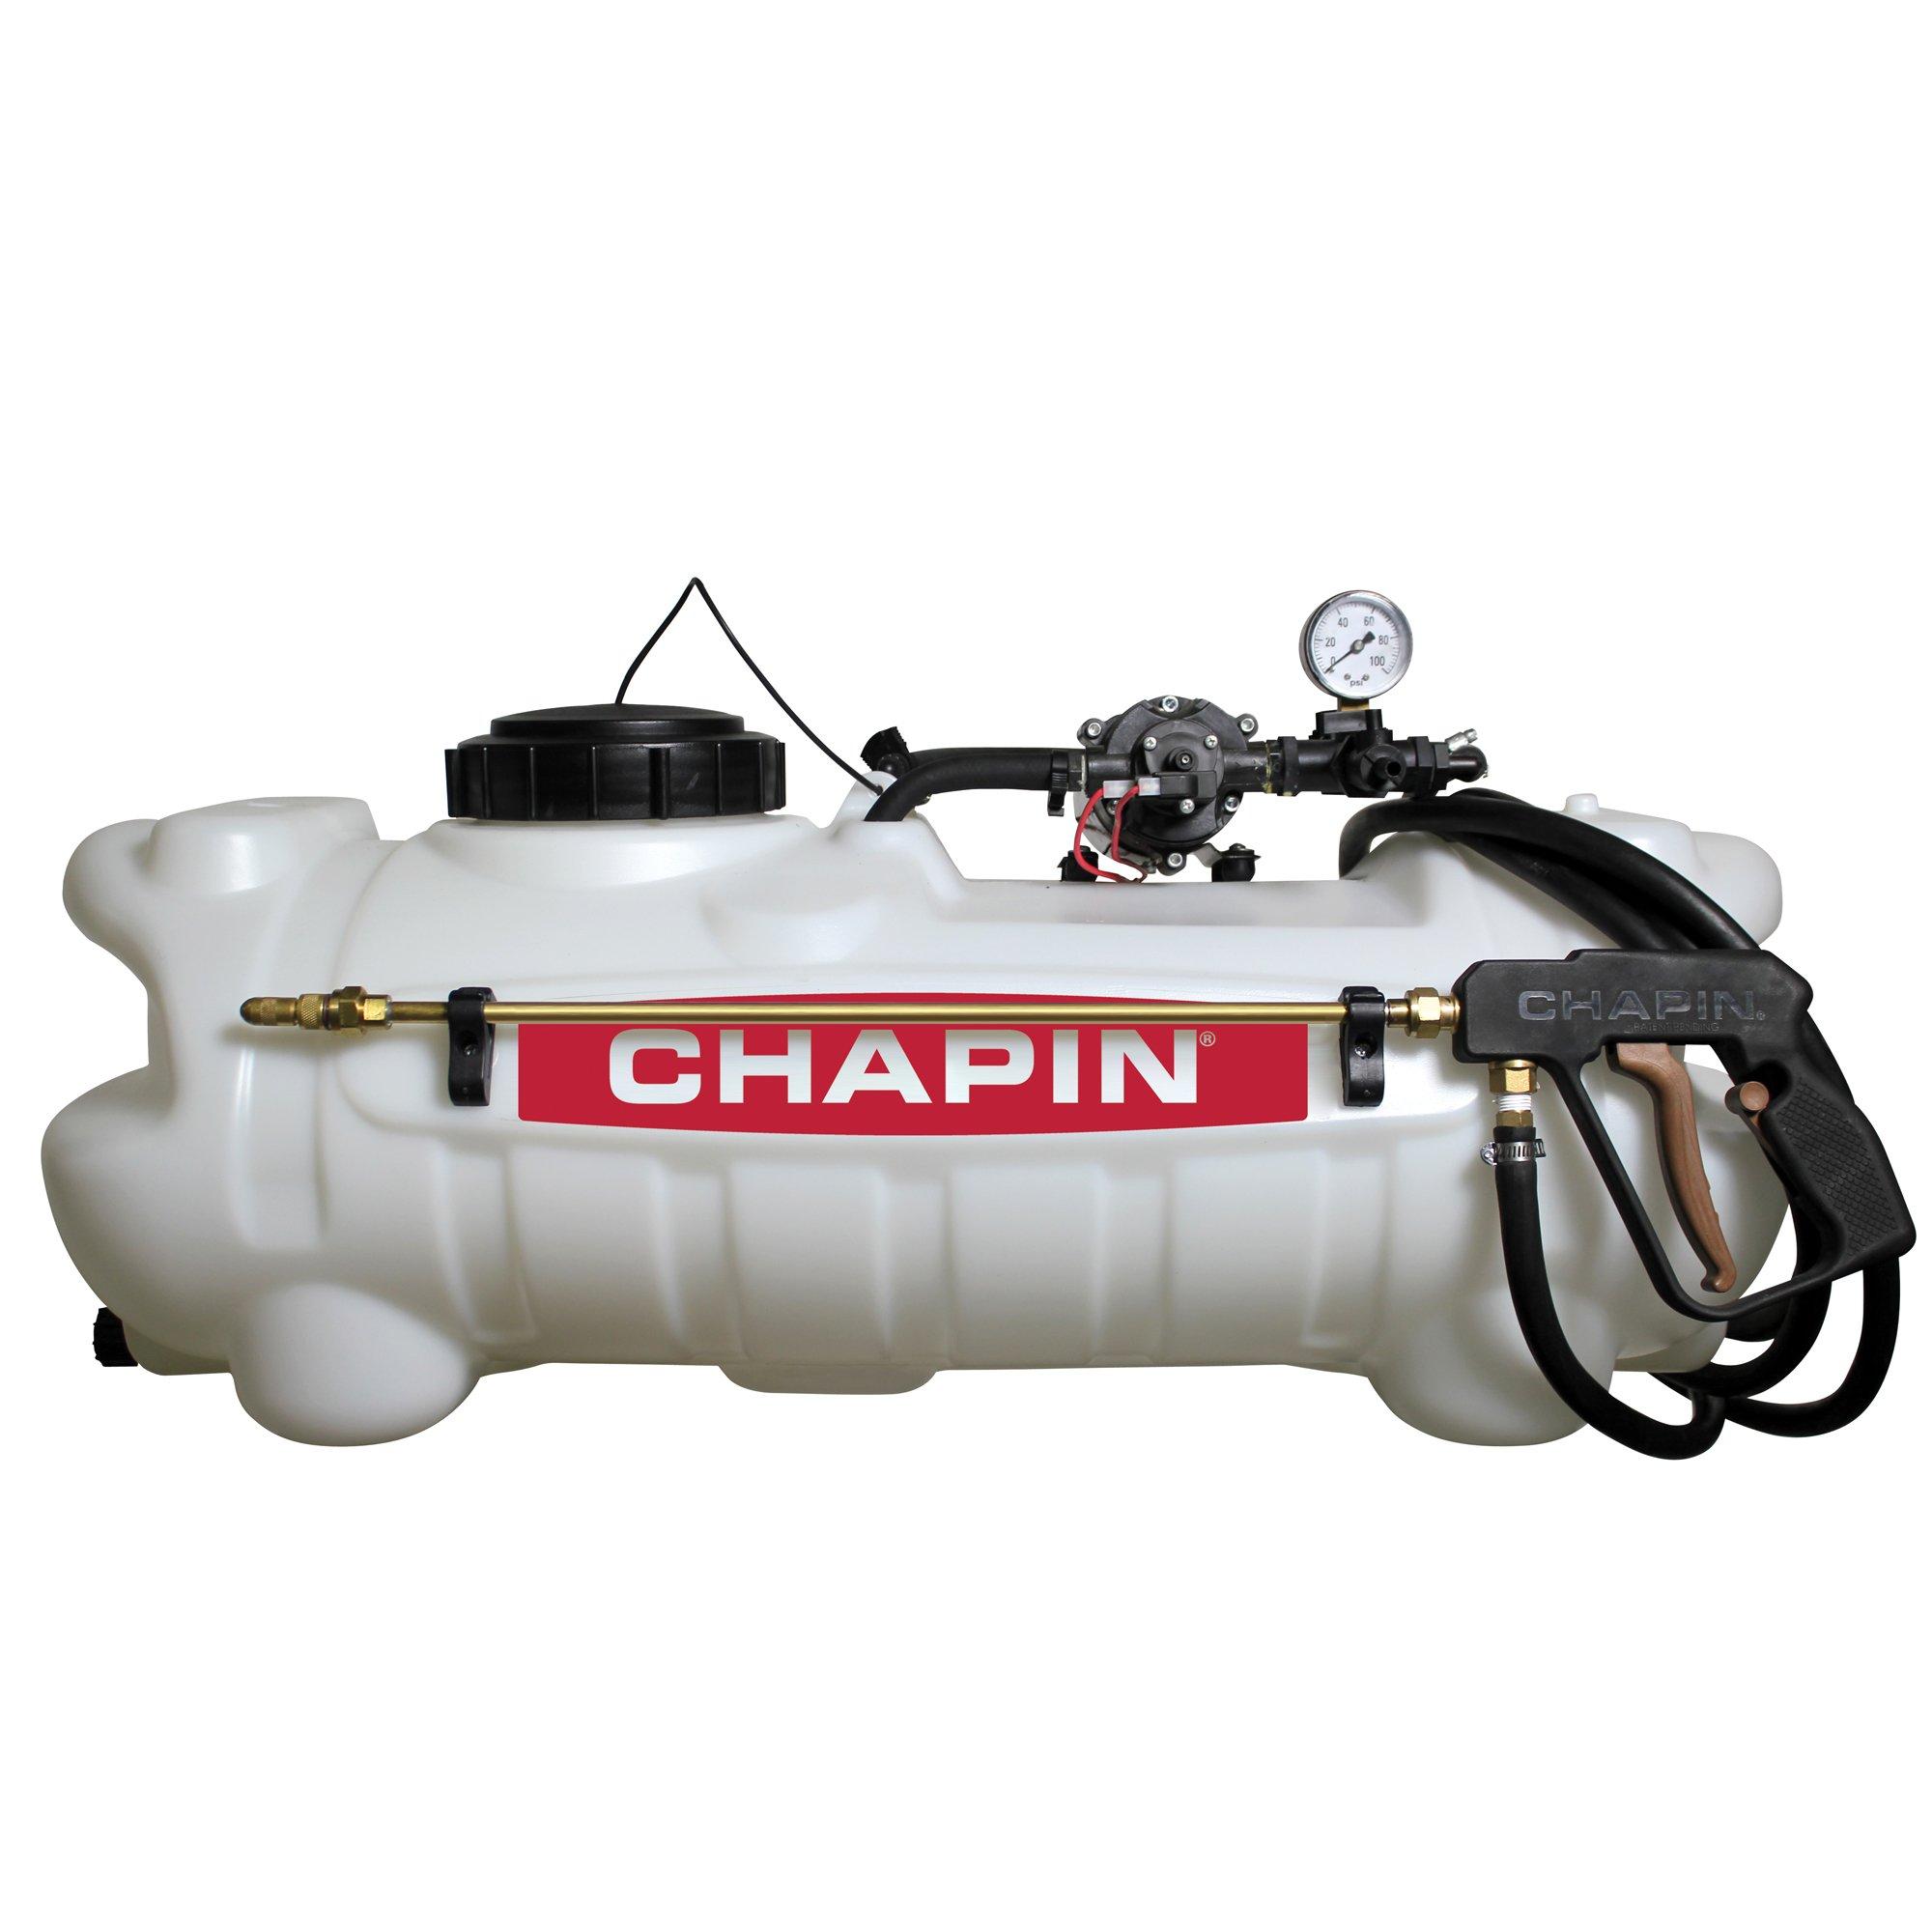 Chapin 97300 15-Gallon 12v Deluxe Dripless EZ mount ATV Spot Sprayer by Chapin International (Image #1)